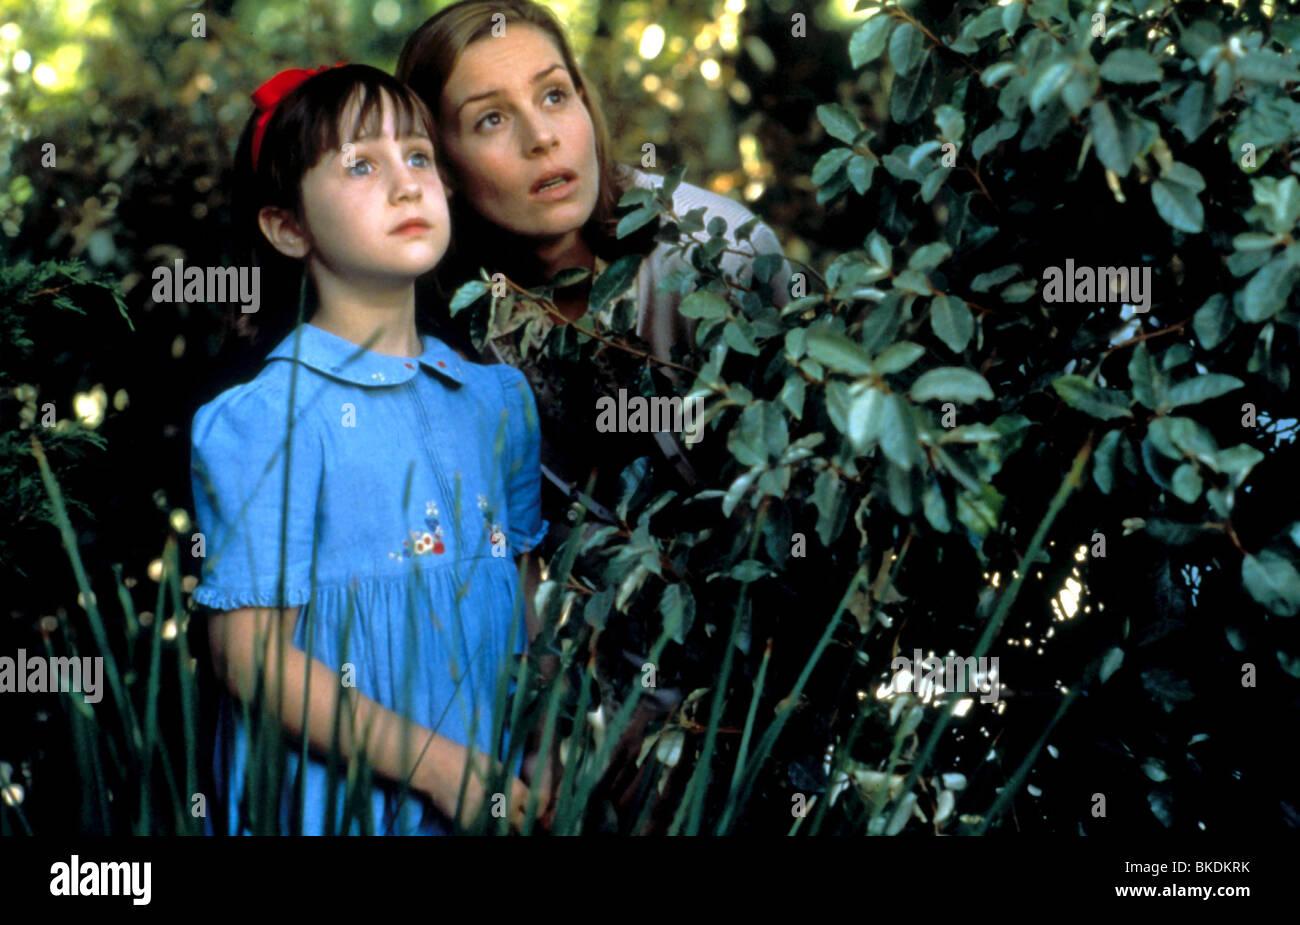 MATILDA (1996) MARA WILSON, EMBETH DAVIDTZV MATI 099 - Stock Image